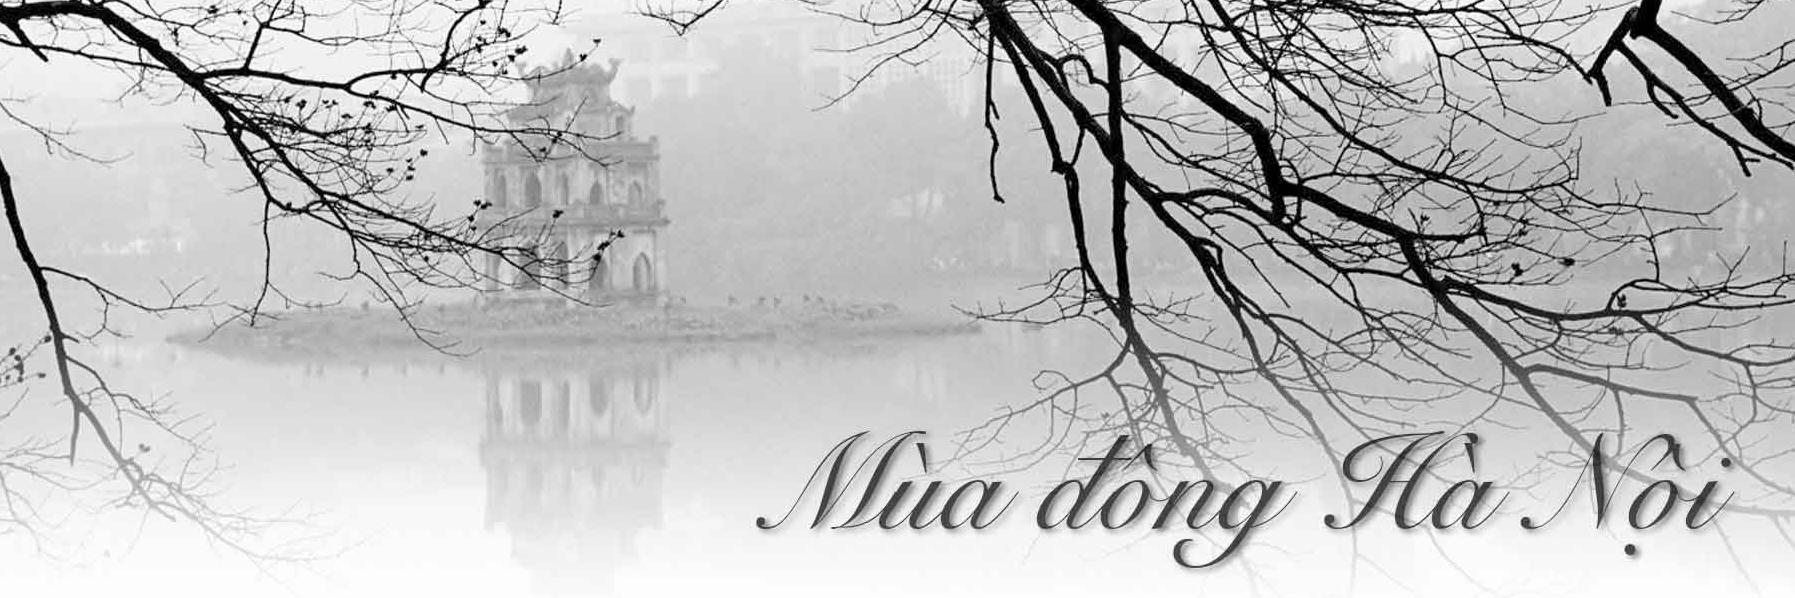 https://gody.vn/blog/lifeandgostudio4271/post/mua-dong-ha-noi-dep-lam-day-5837